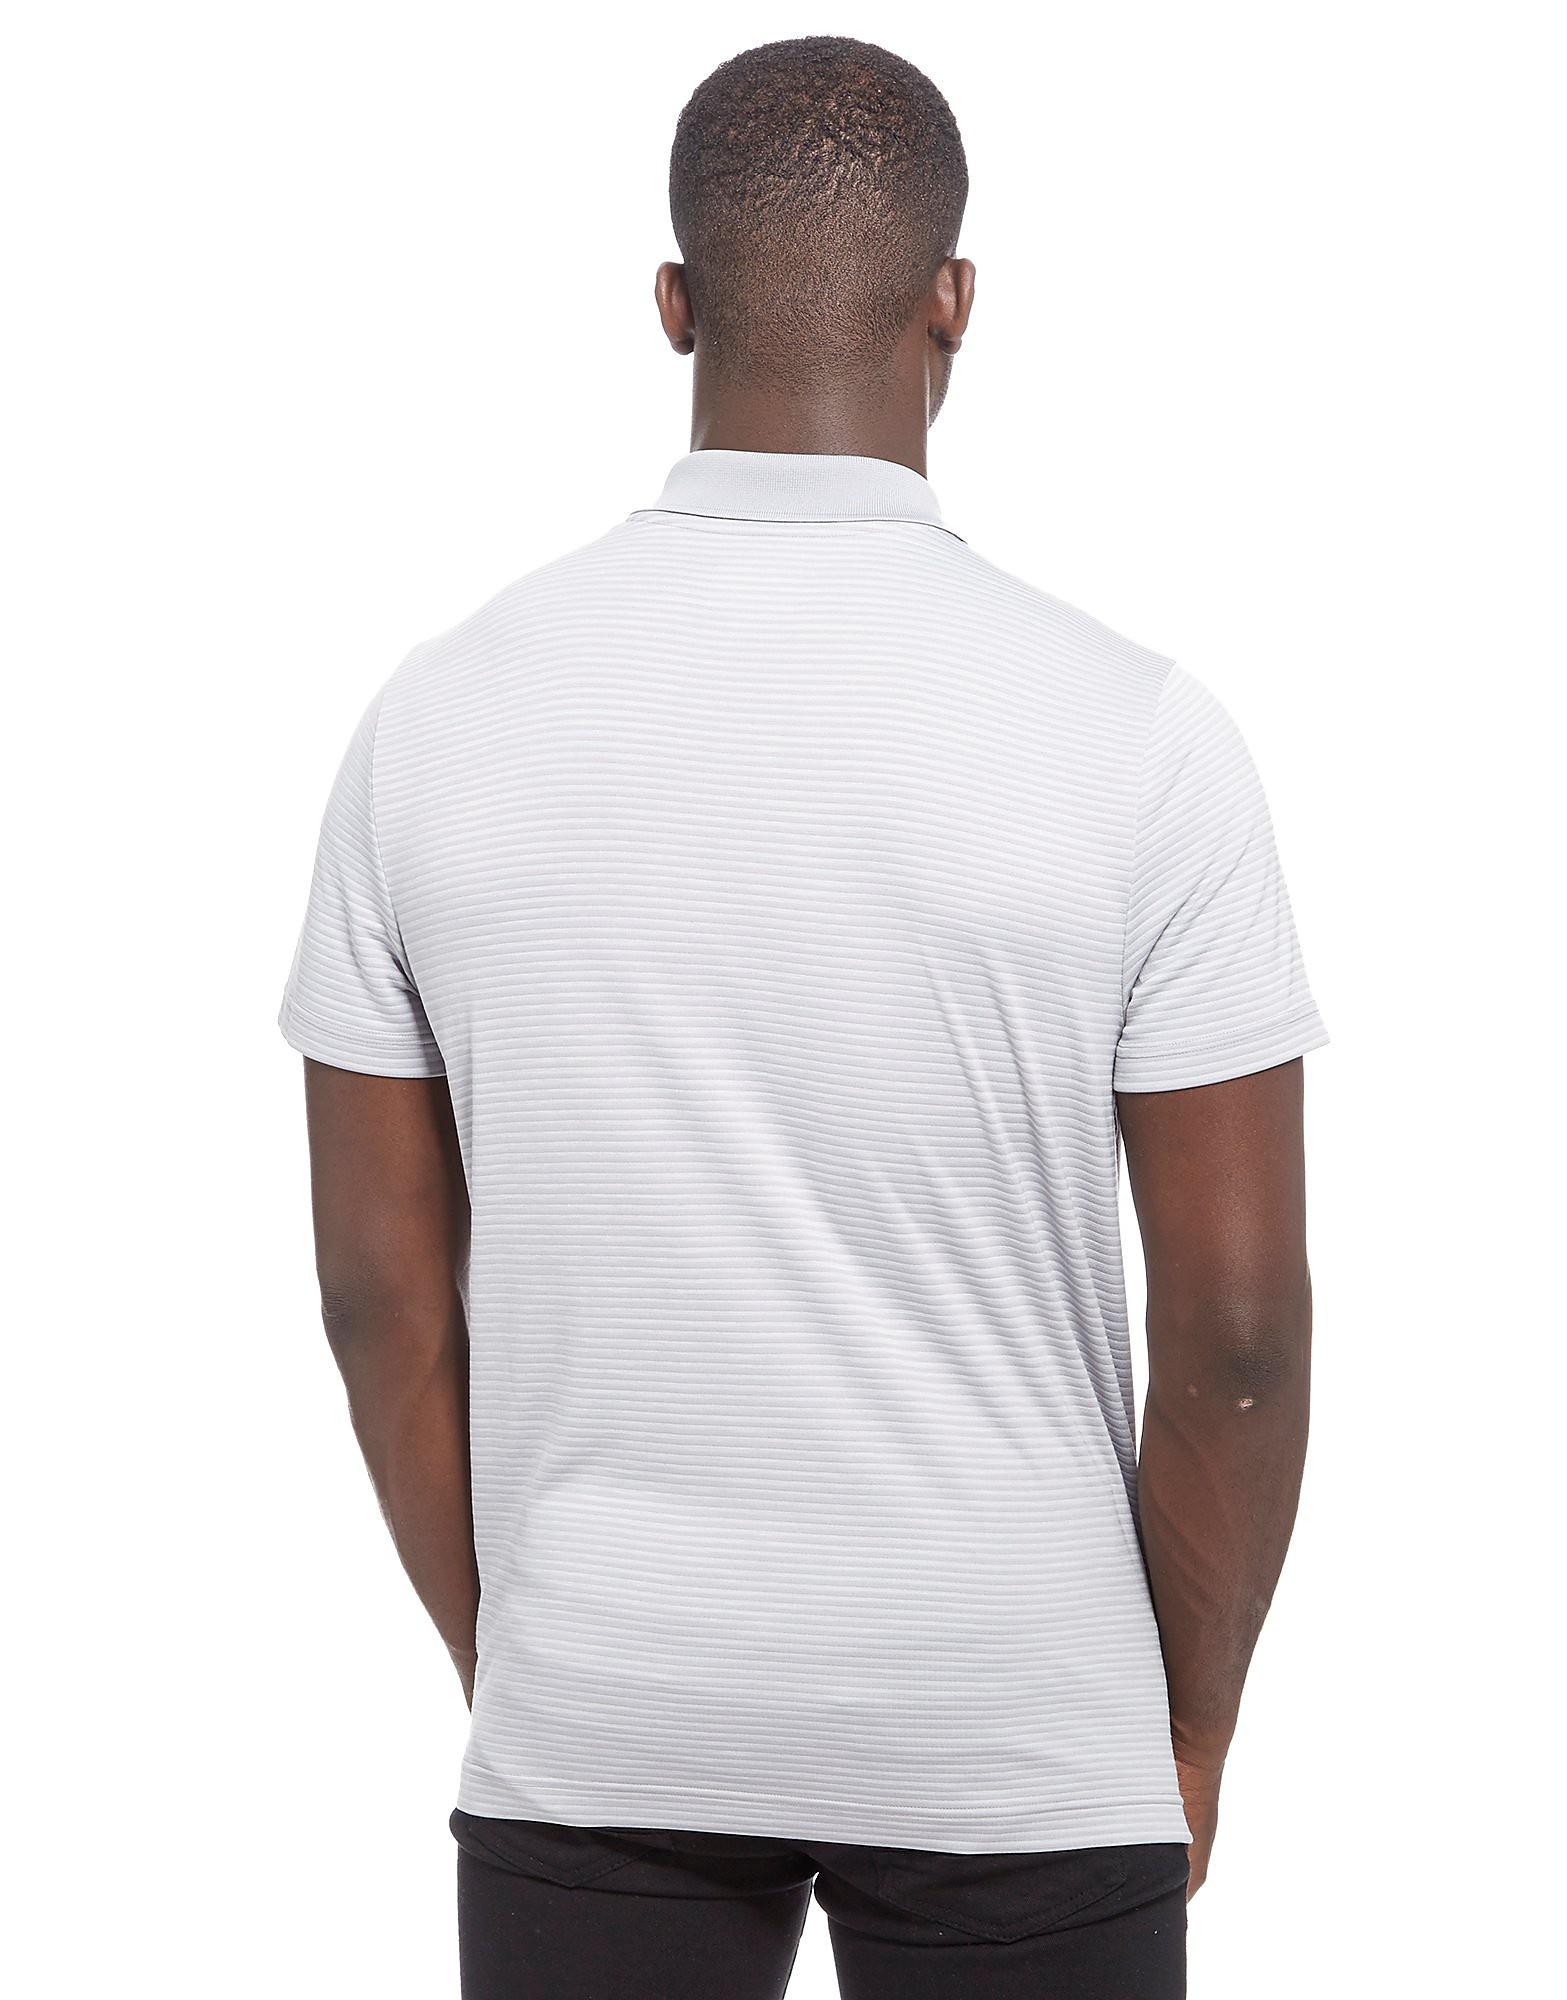 Lacoste Marl Stripe Polo Shirt